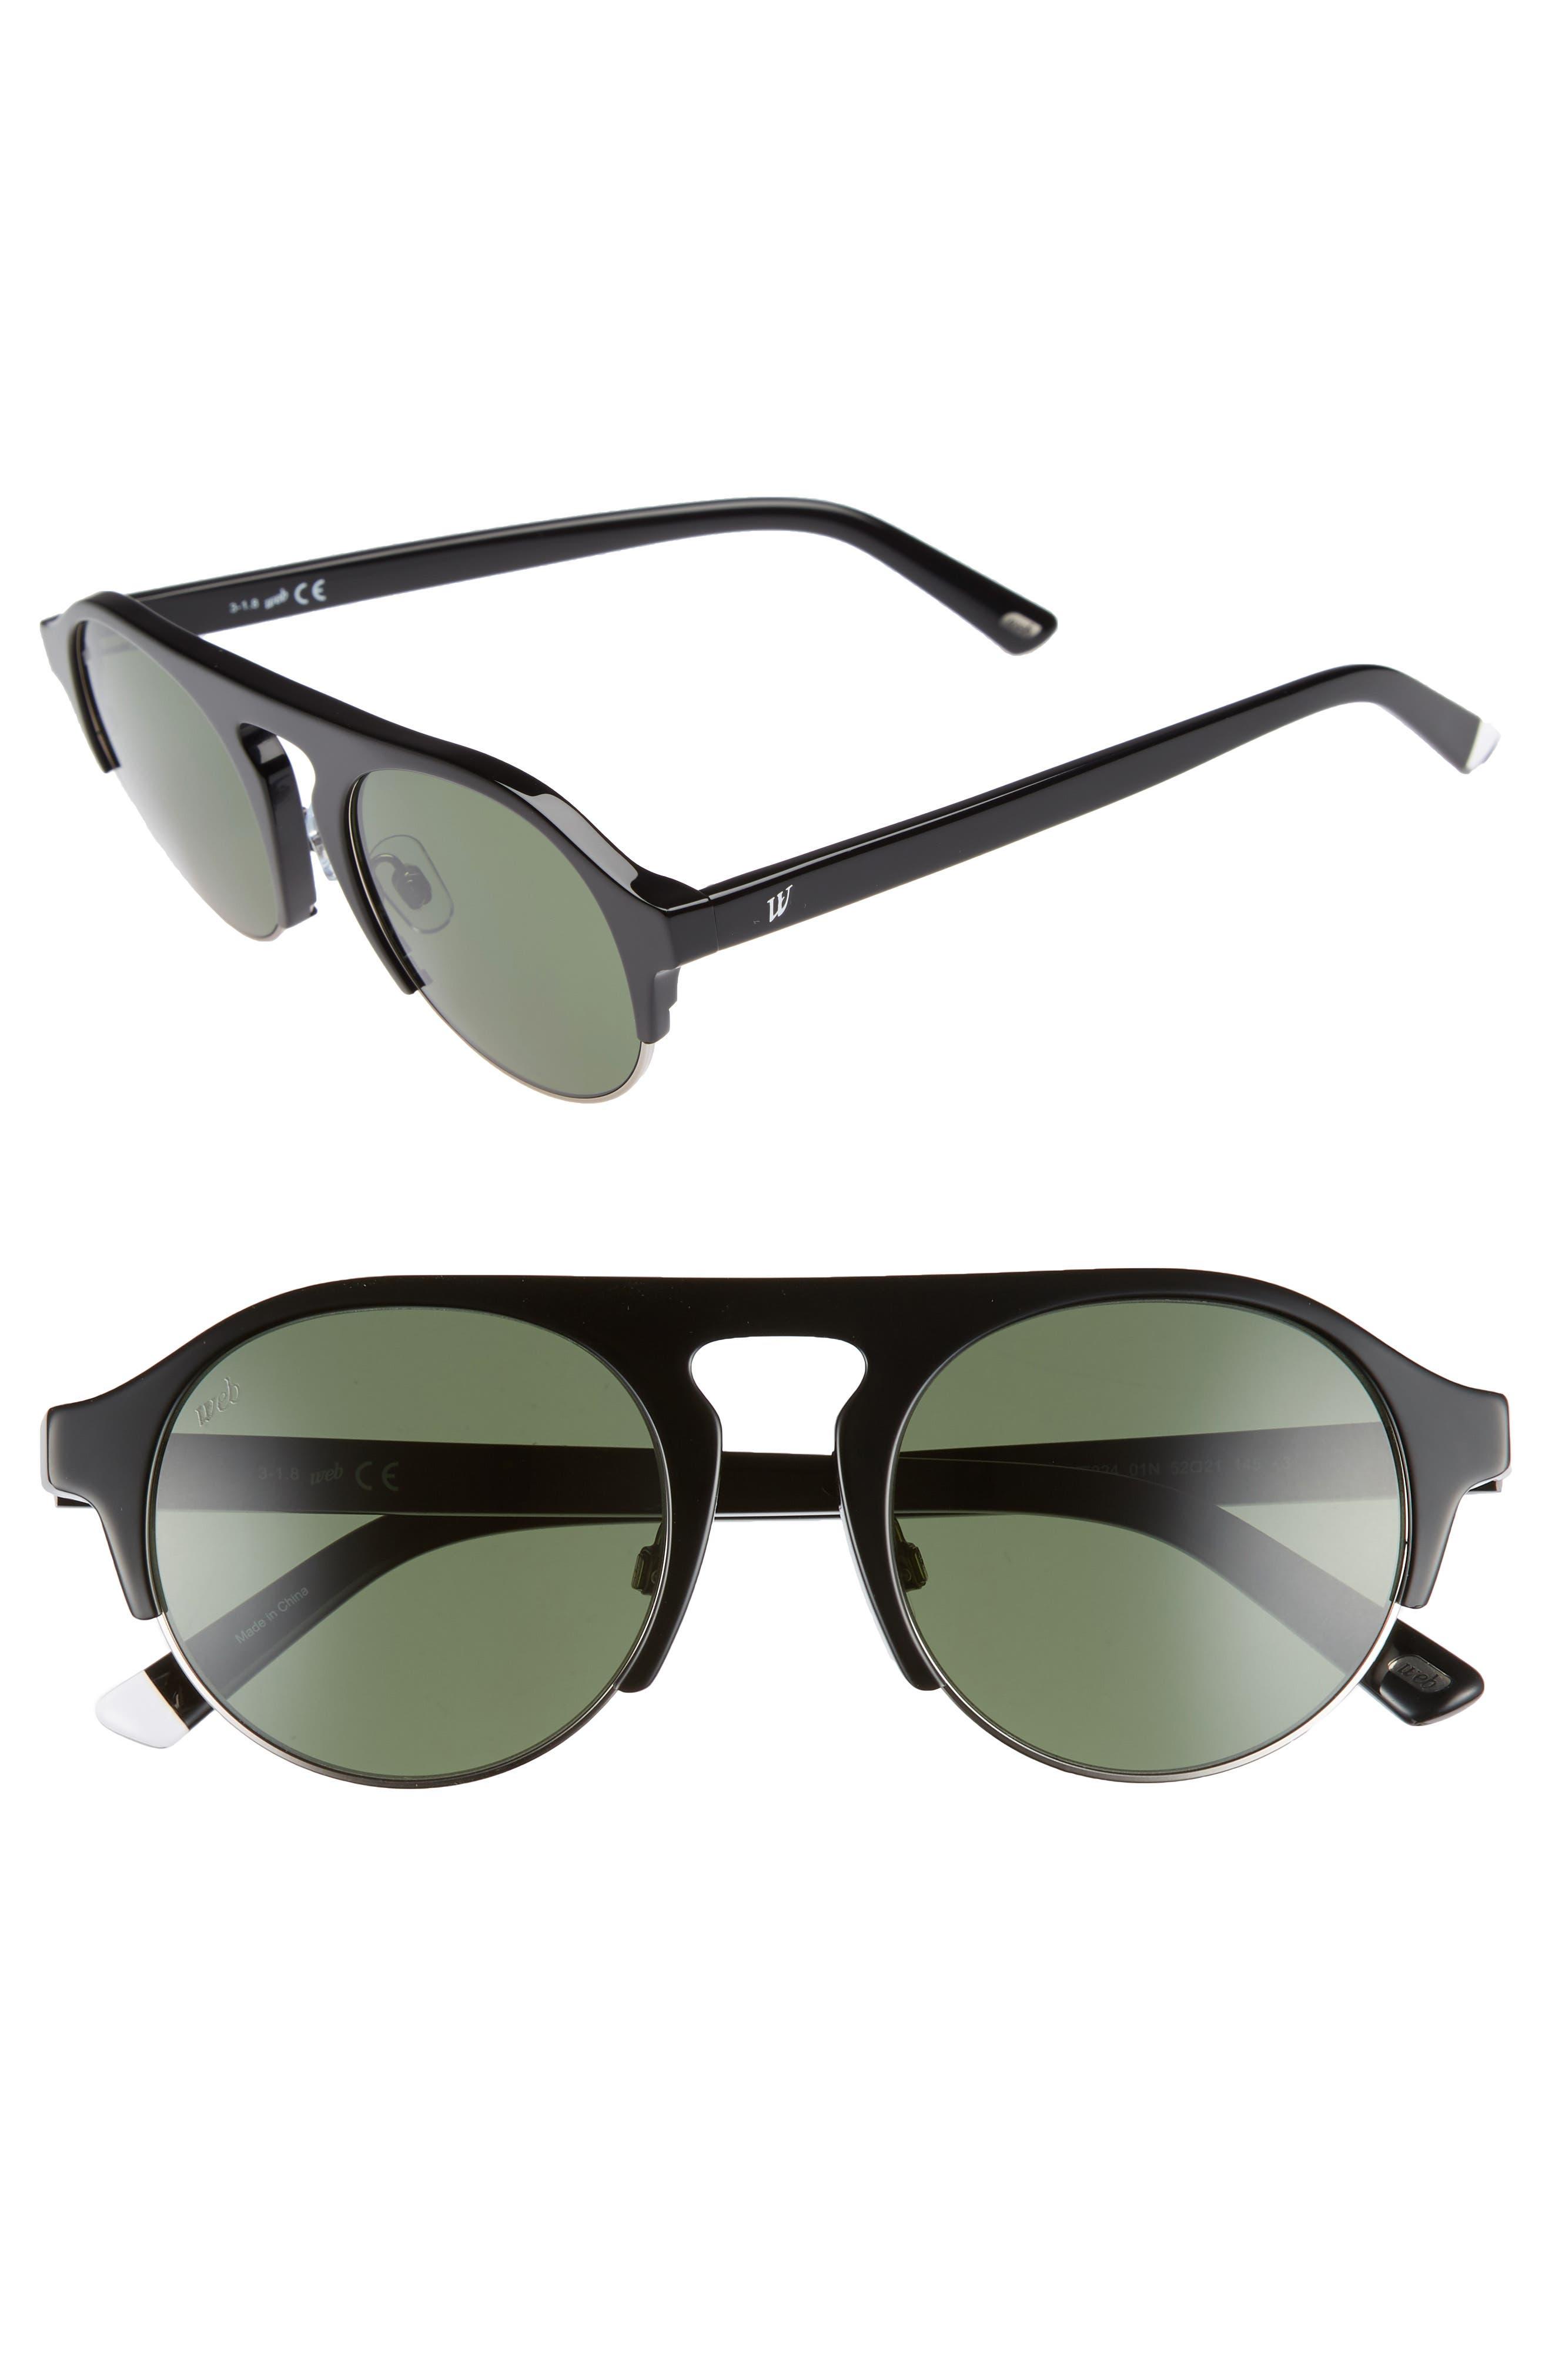 52mm Sunglasses,                         Main,                         color, SHINY BLACK/ GREEN